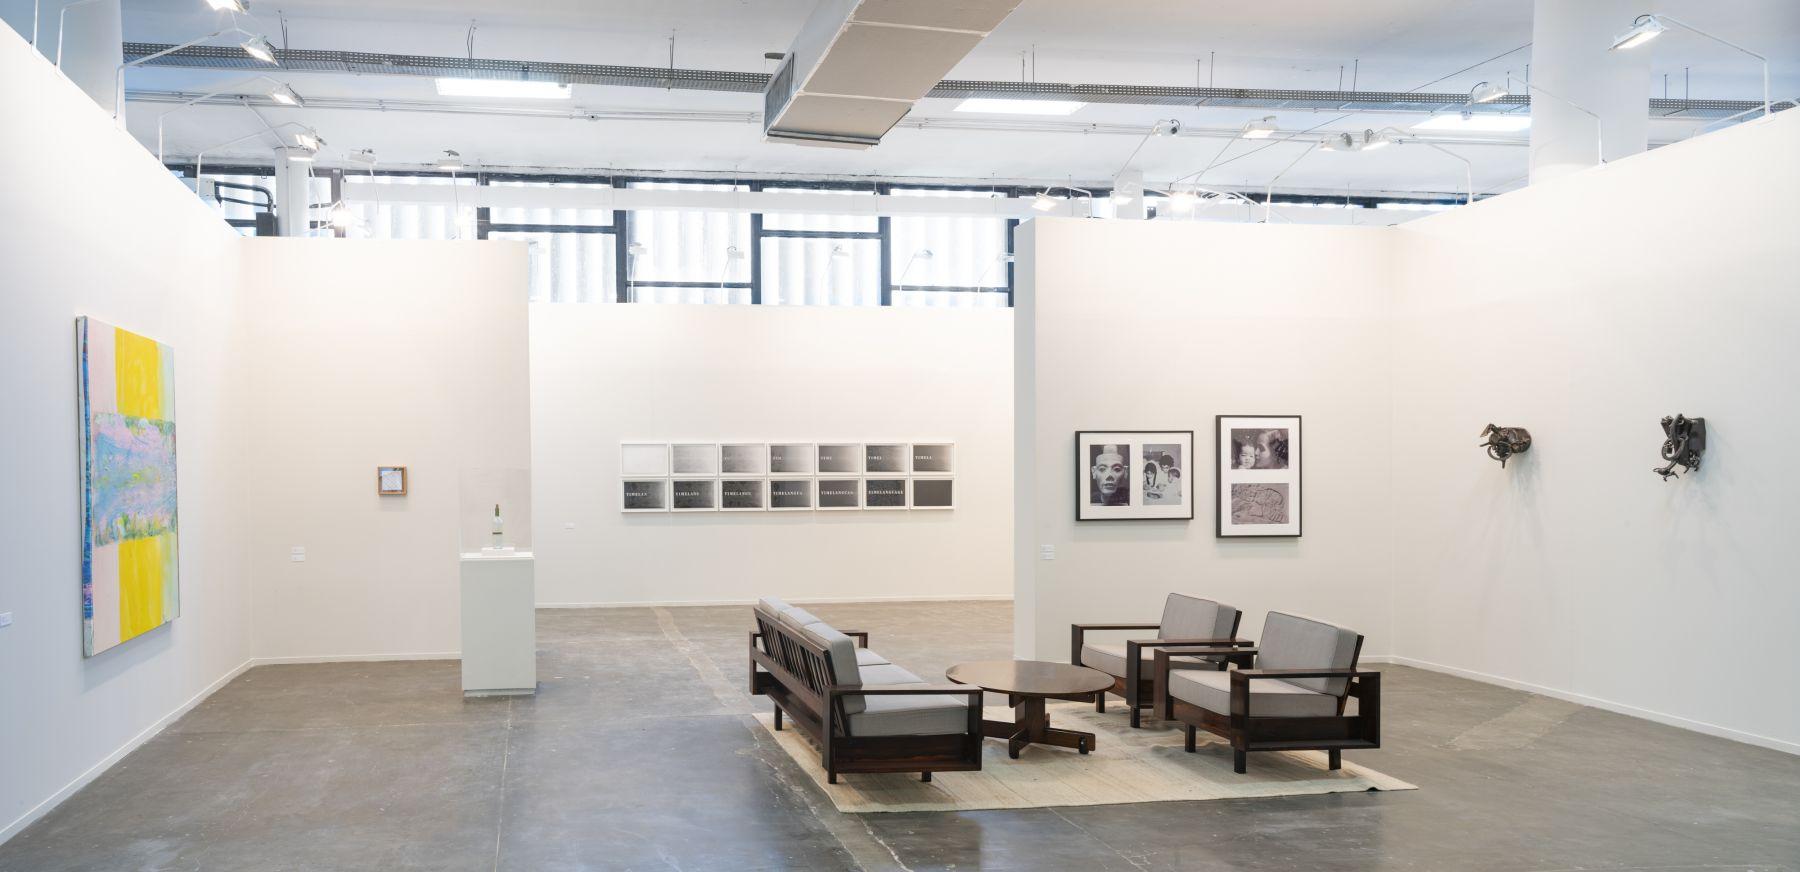 Alexander Gray AssociatesSP-Arte 2018Installation view